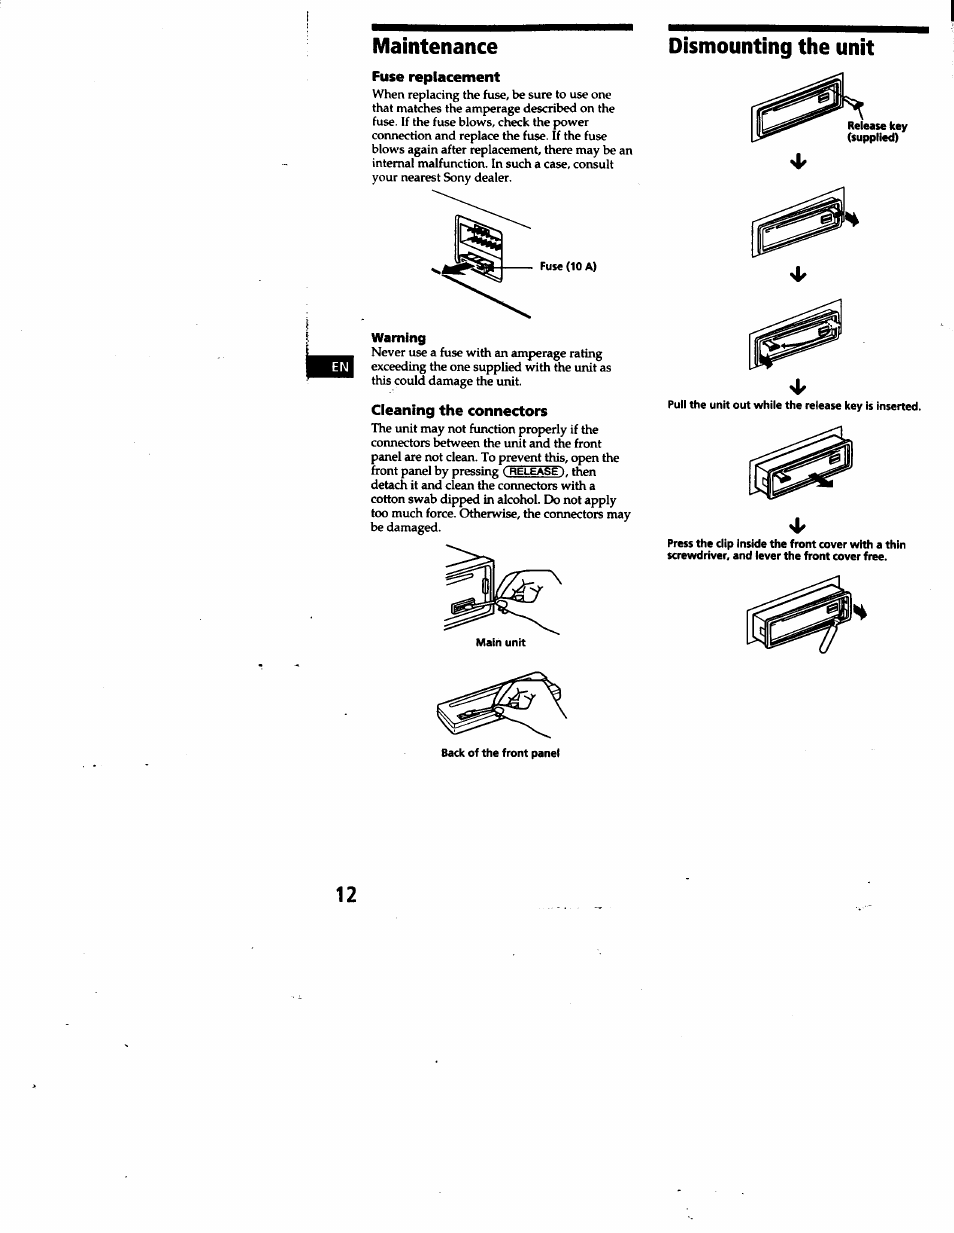 Sony Cdx 4180 User Manual